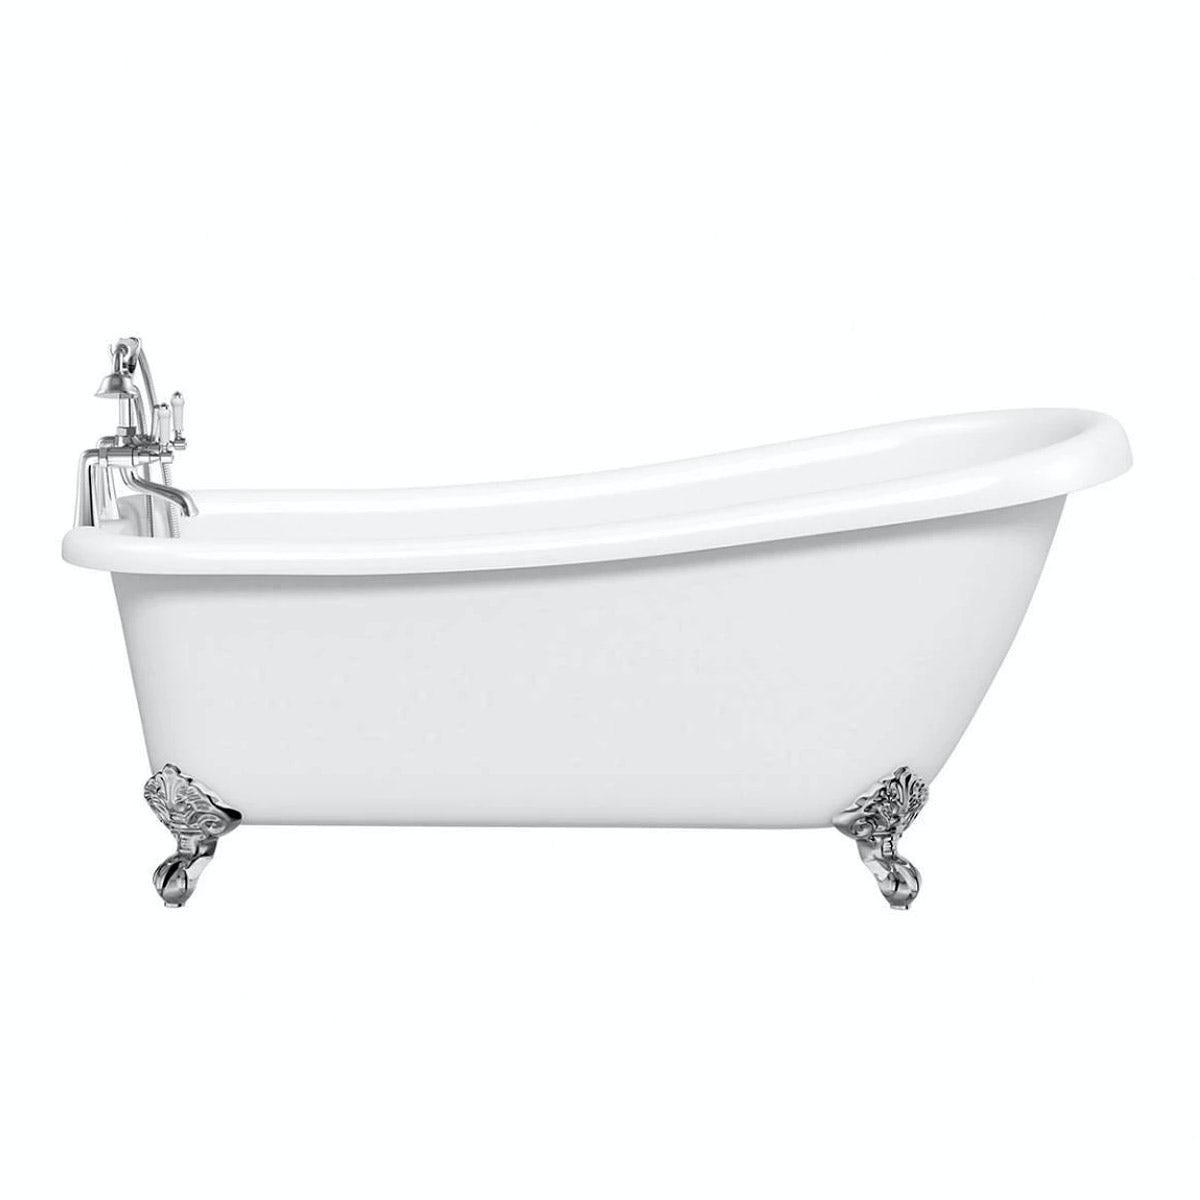 Deco Bathroom Suite With Slipper Bath Small Victoriaplum Com